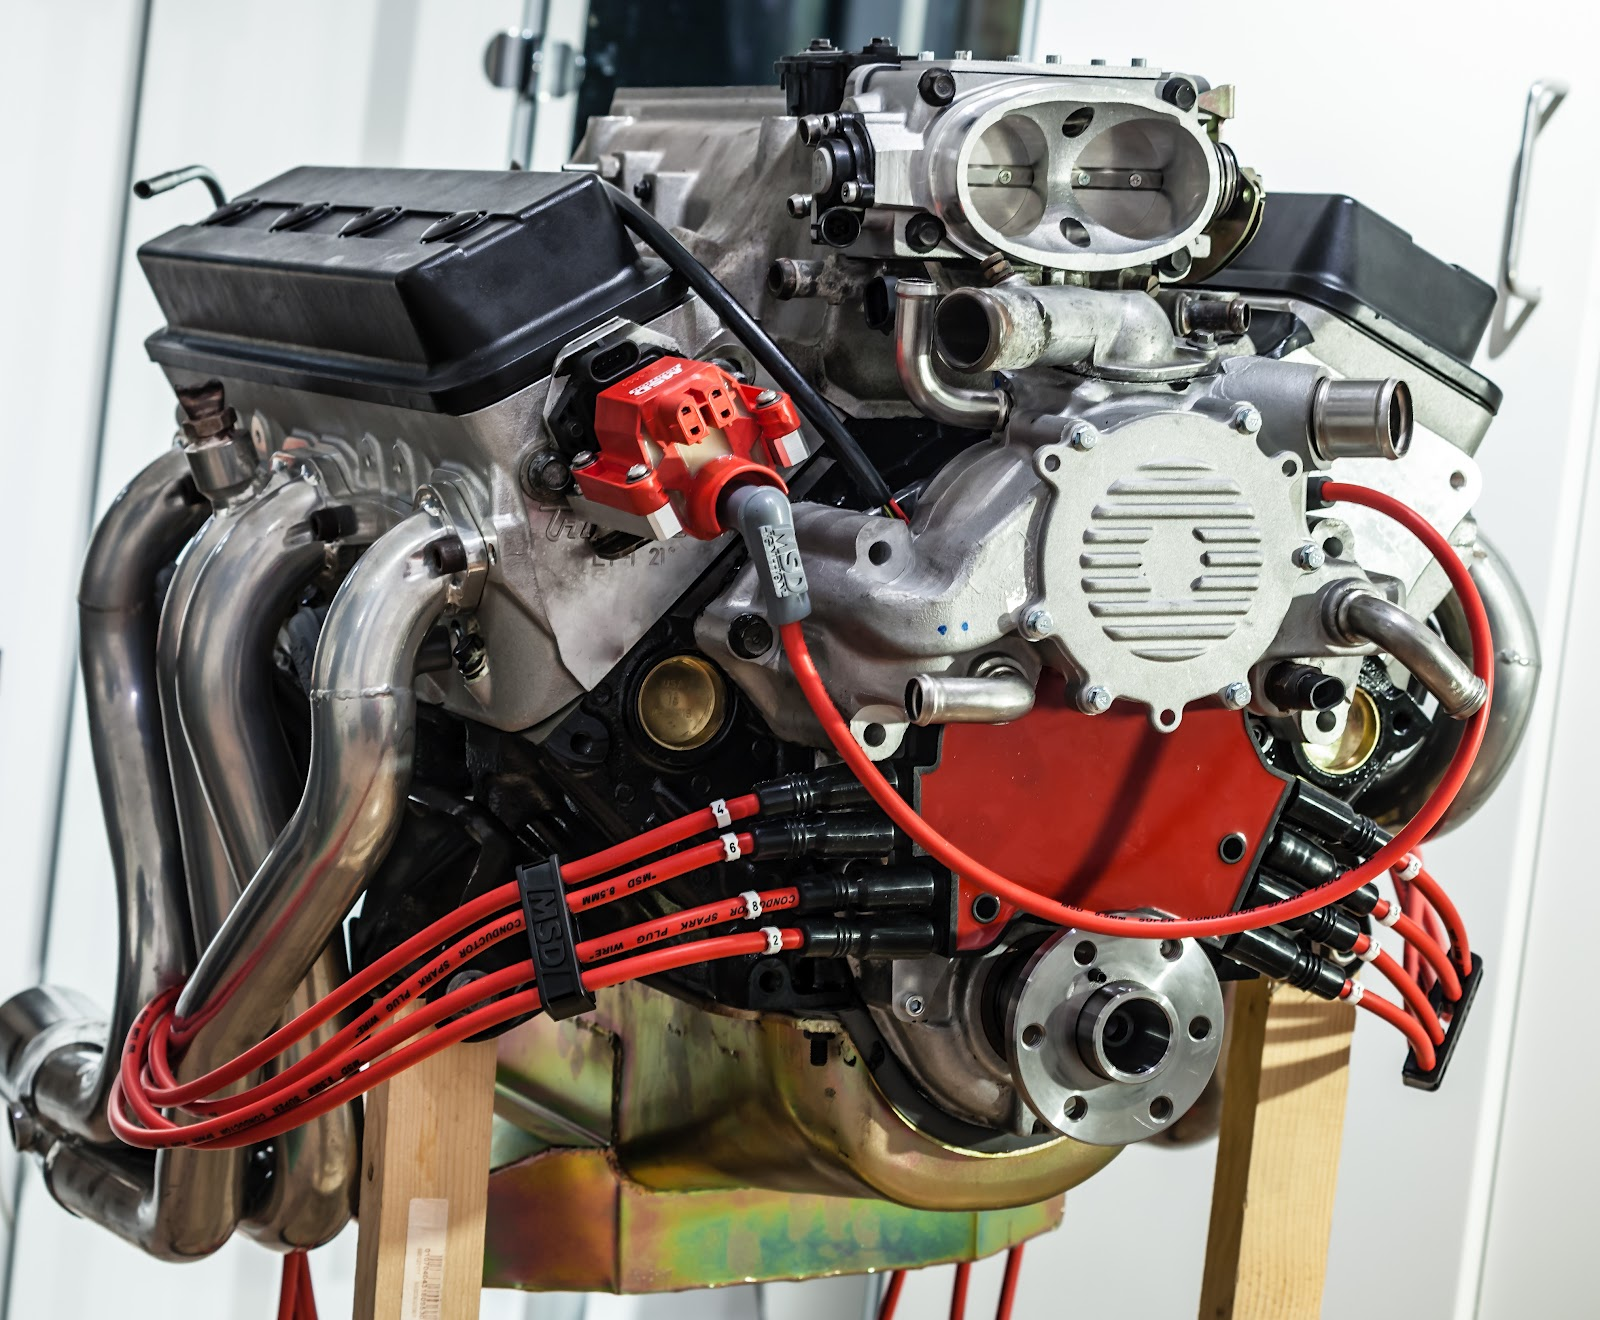 hight resolution of 1993 corvette engine shuts off immediately corvetteforum chevrolet corvette forum discussion